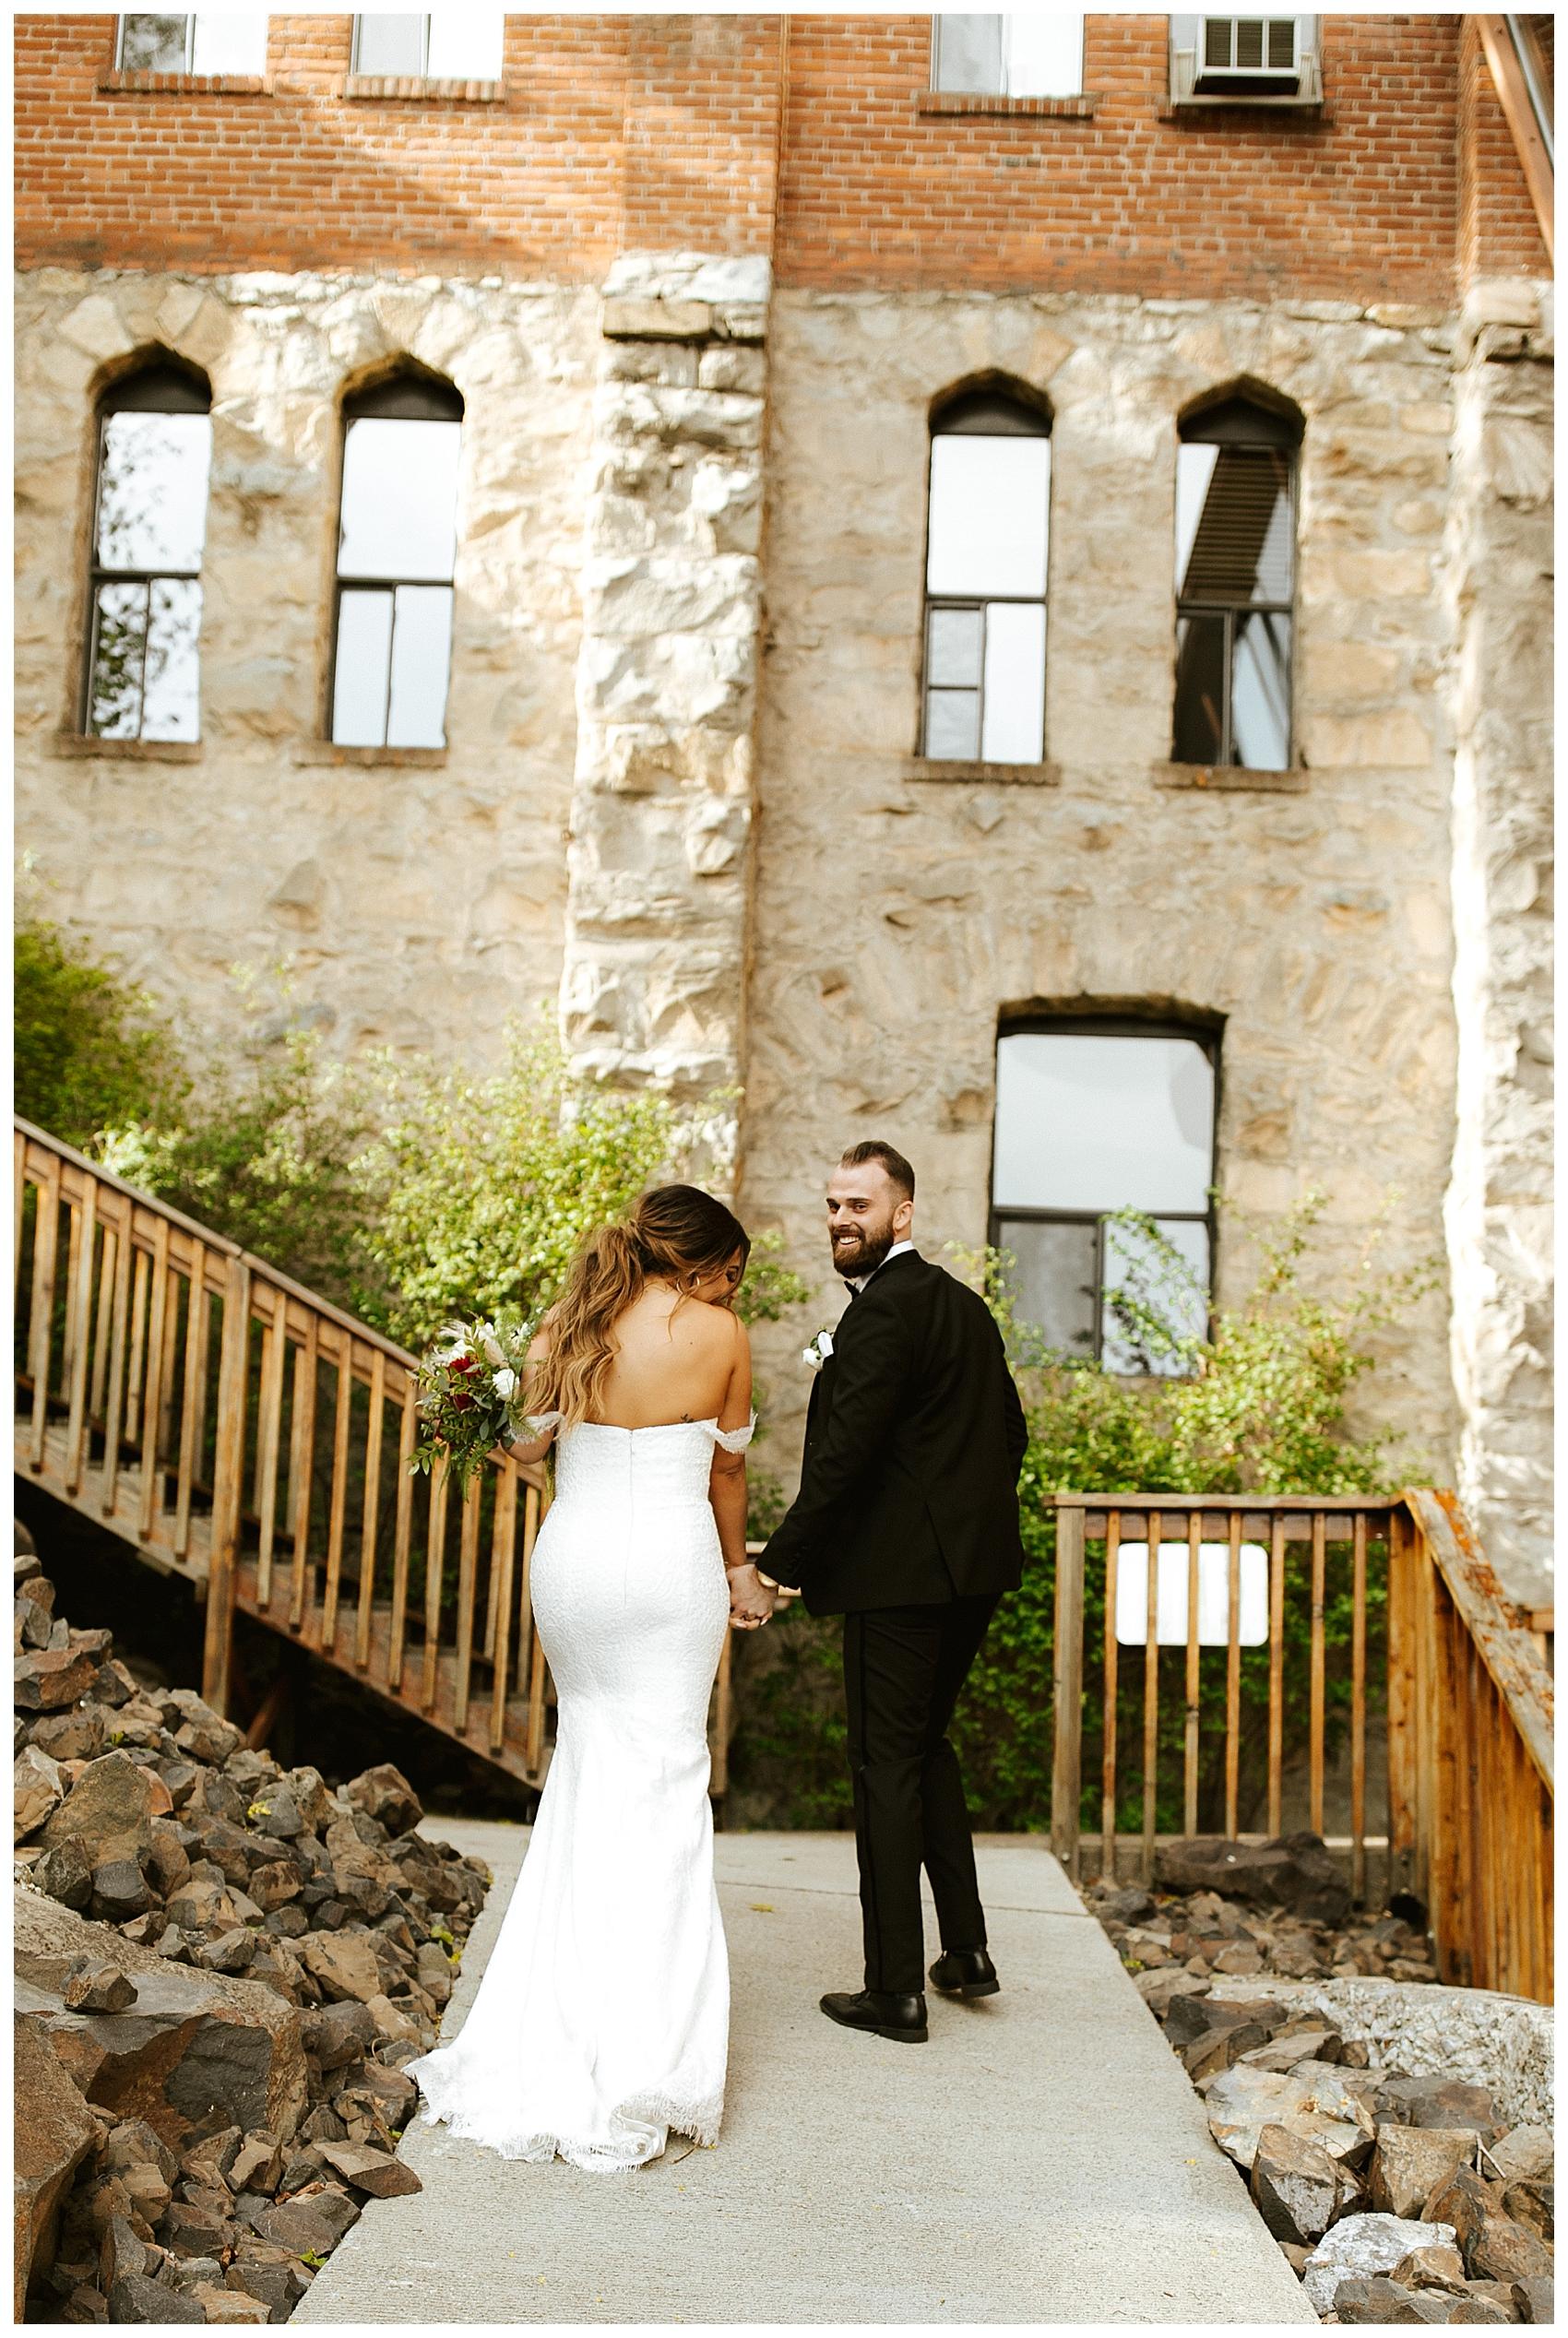 Chateau Rive Spokane Wedding Cassie Trottier Photography01082.jpg